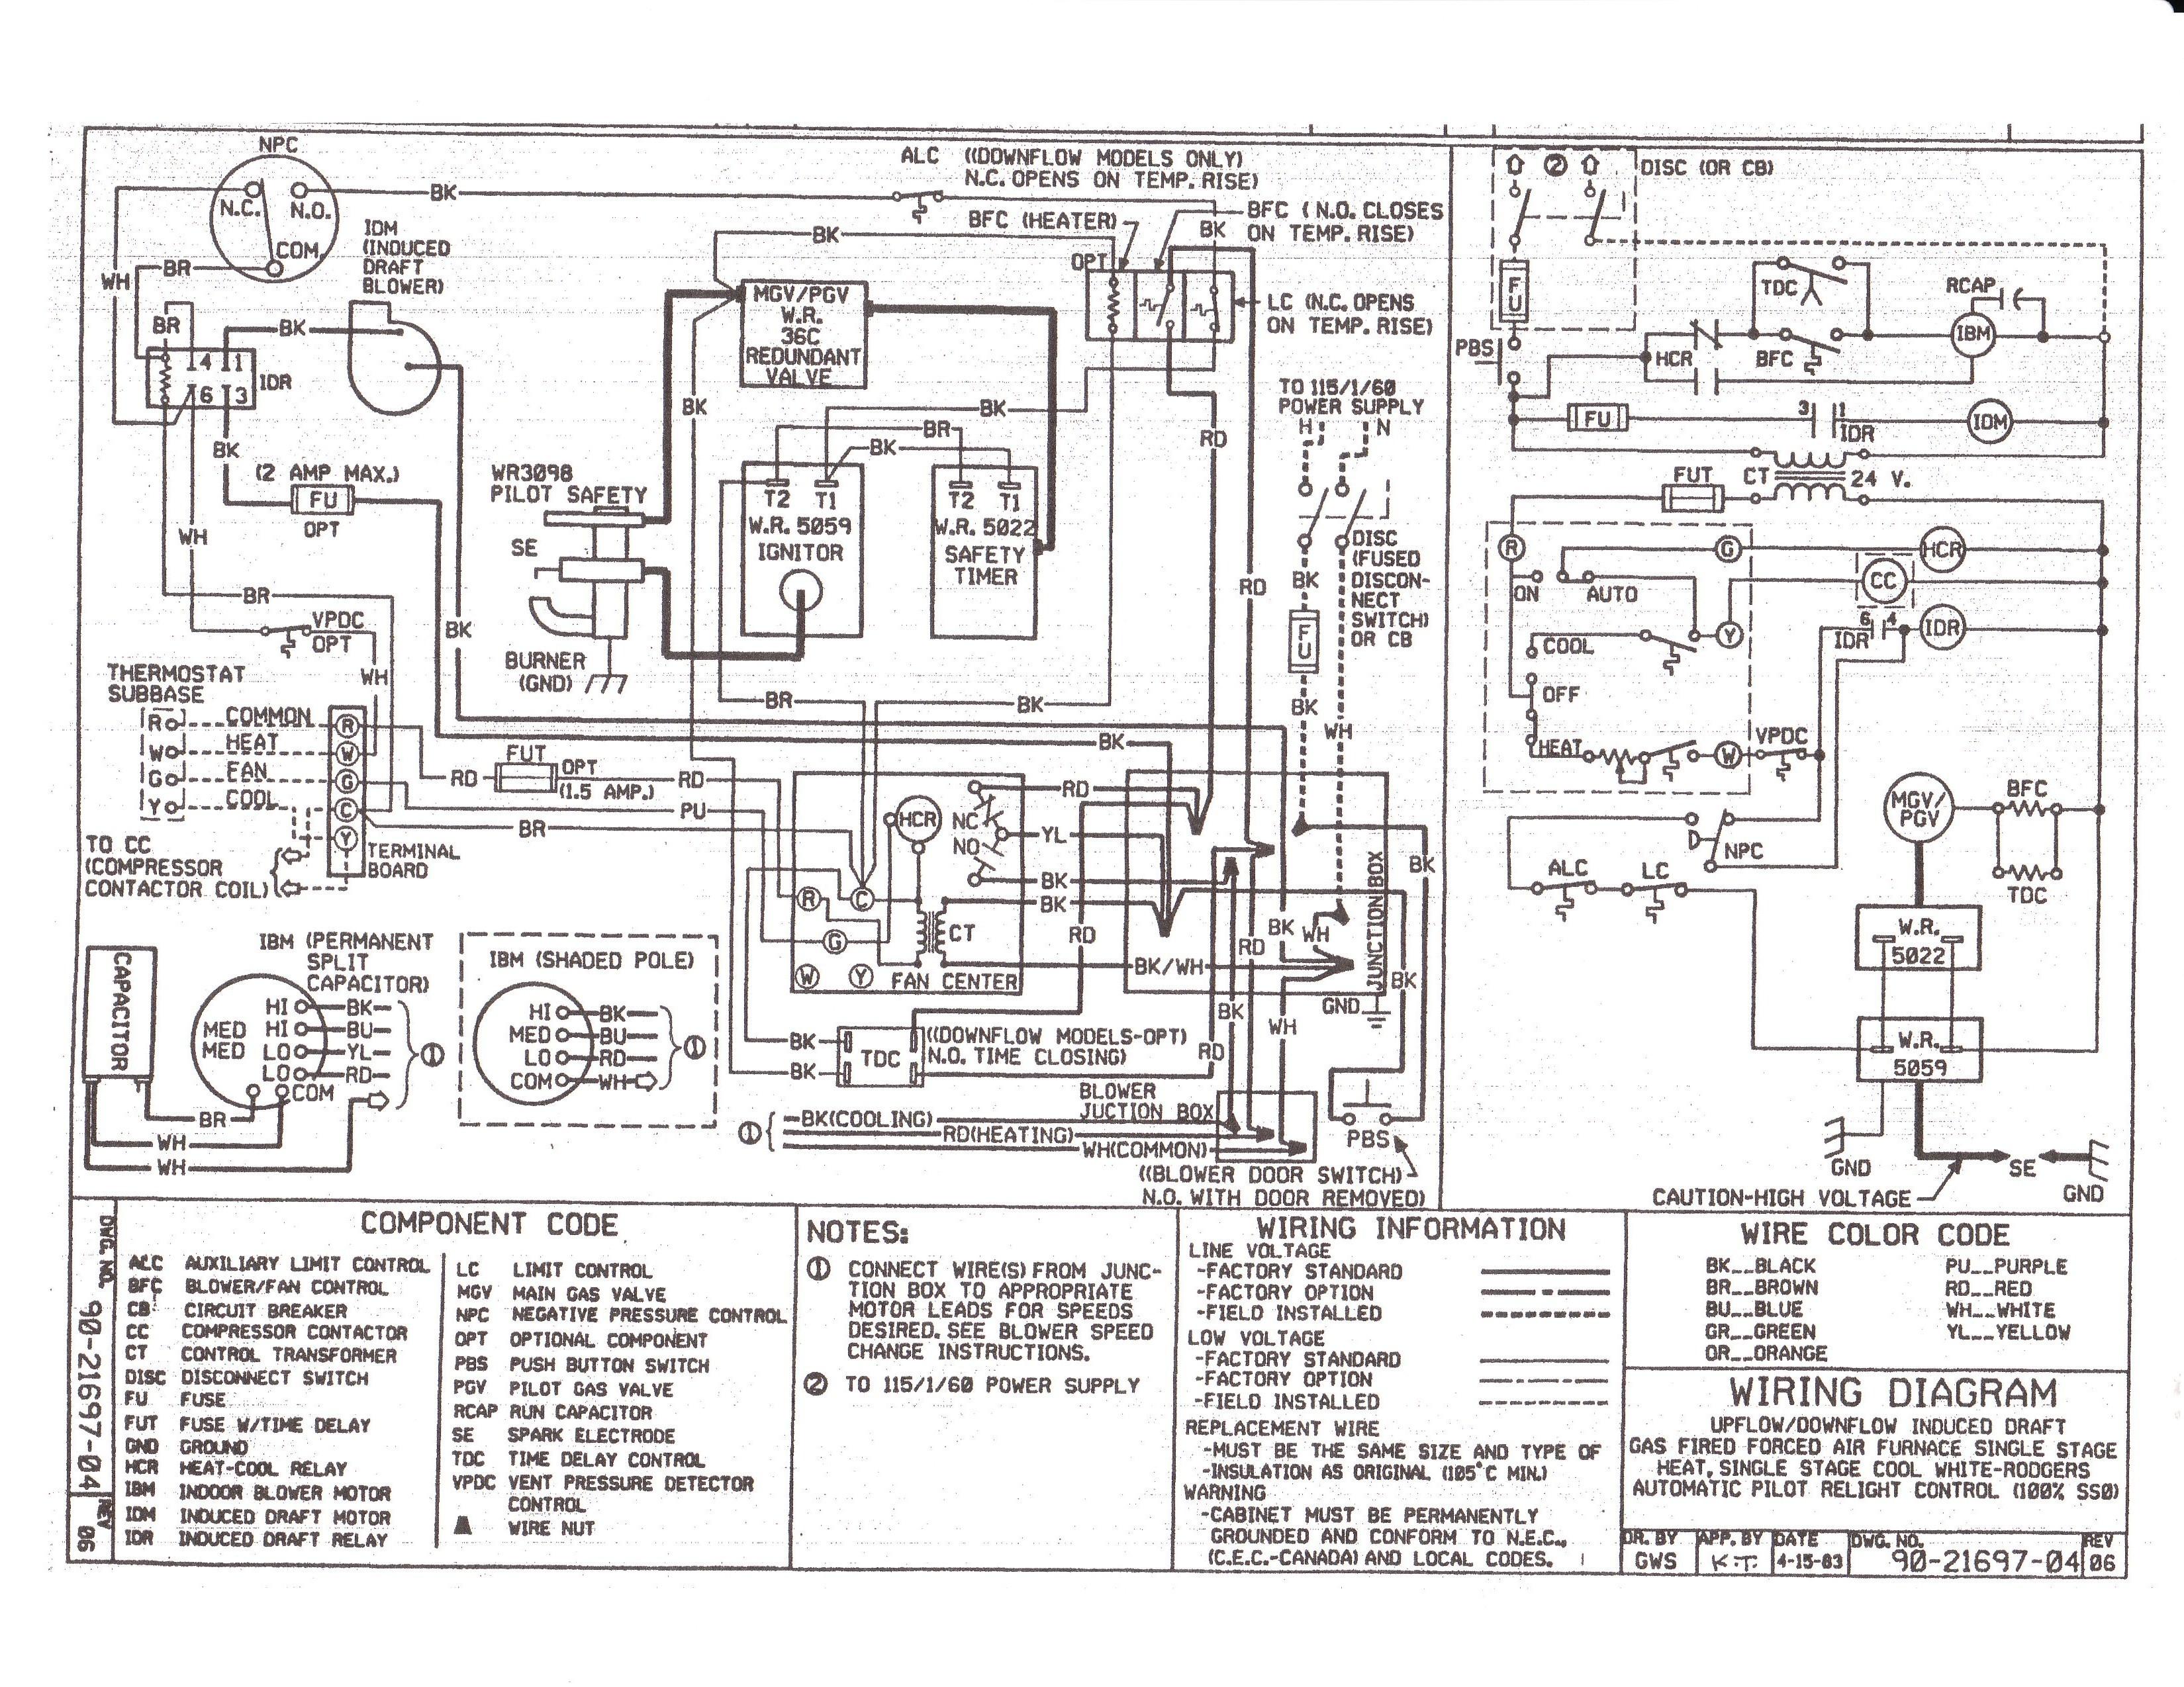 miller gas furnace wiring diagram new fortable electric diagrams coleman gas furnace wiring diagram miller gas